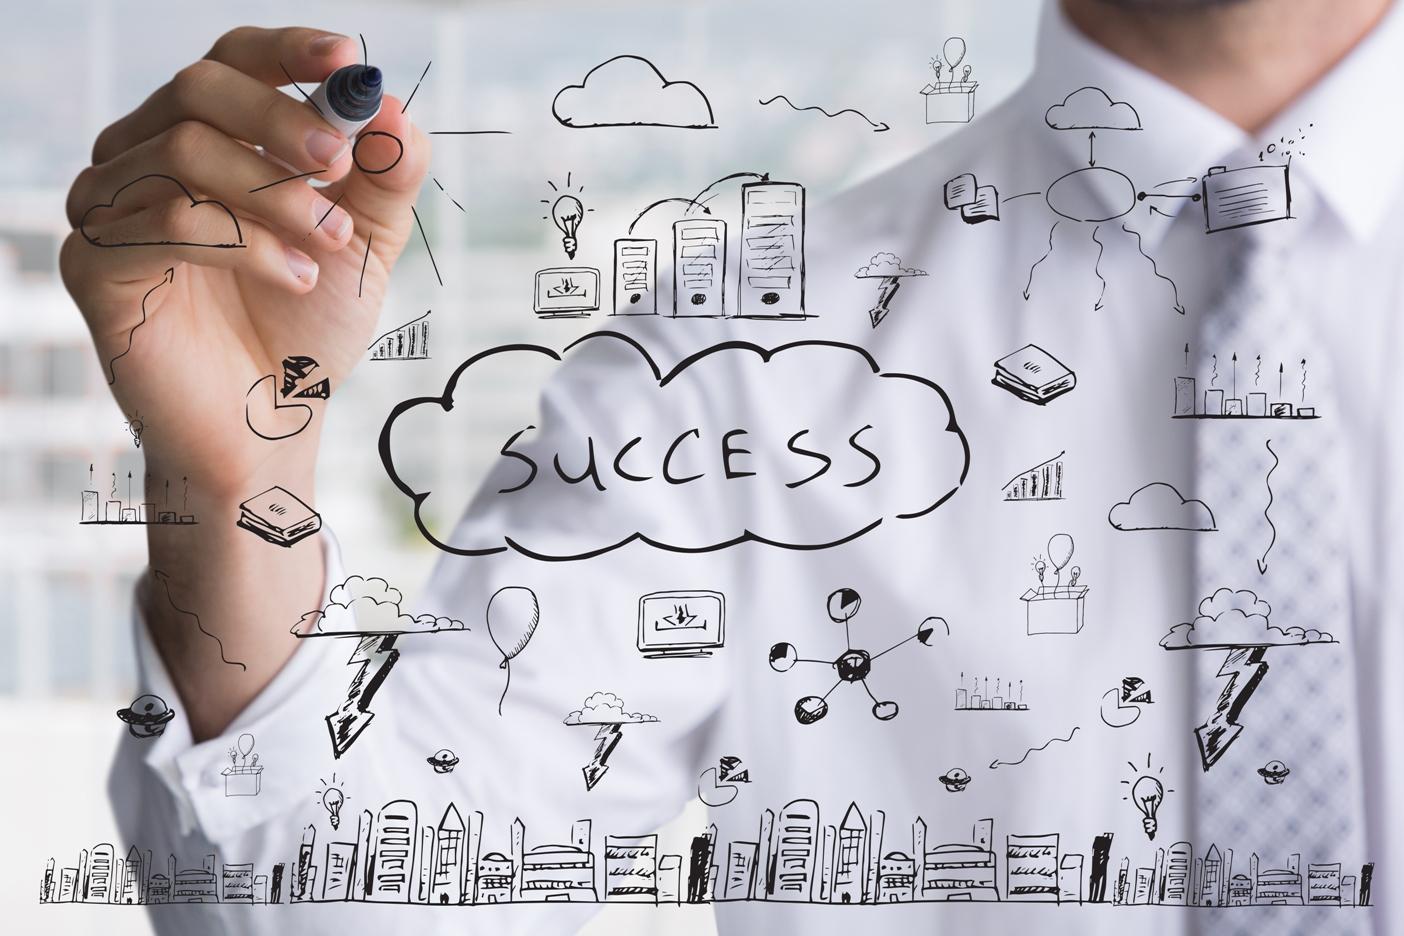 Как начать и вести свой бизнес? Лайфхаки от основателя онлайн-гипермаркета 21vek.by Сергея Вайниловича